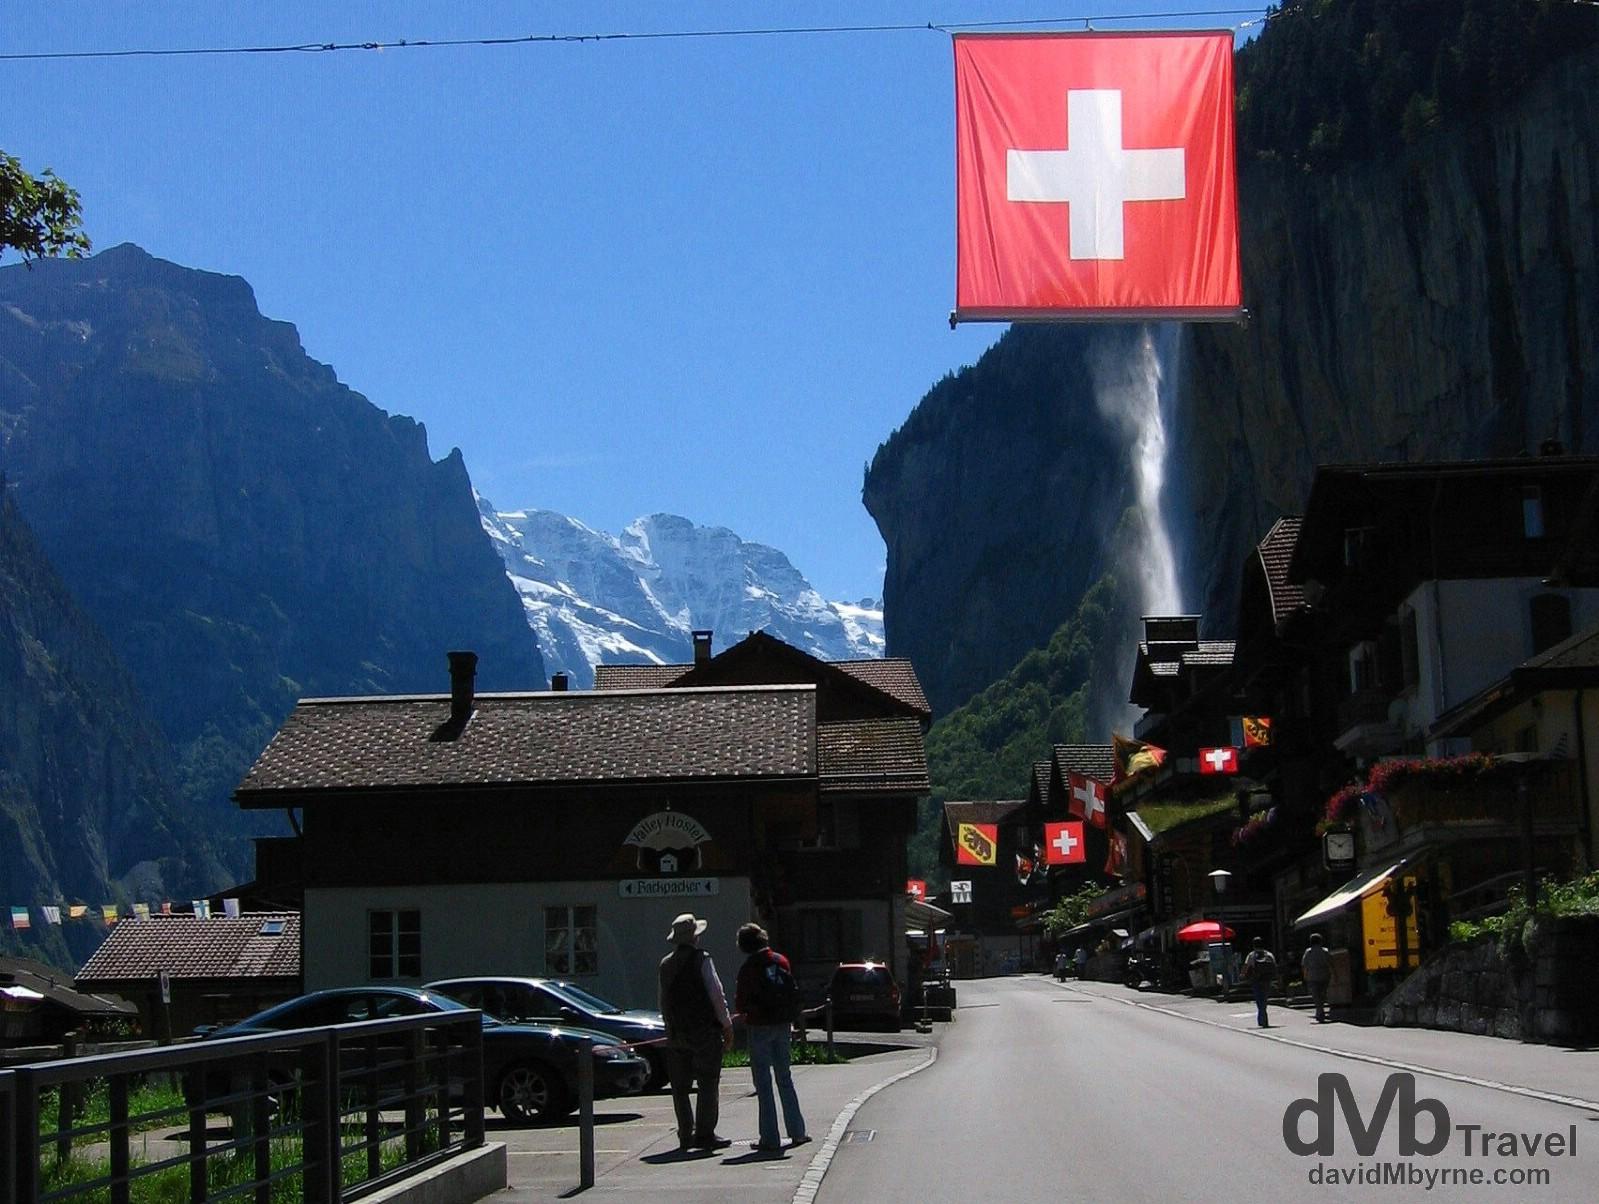 Entering the village of Lauterbrunnen, Jungfrau region, Switzerland. August 24th, 2007.